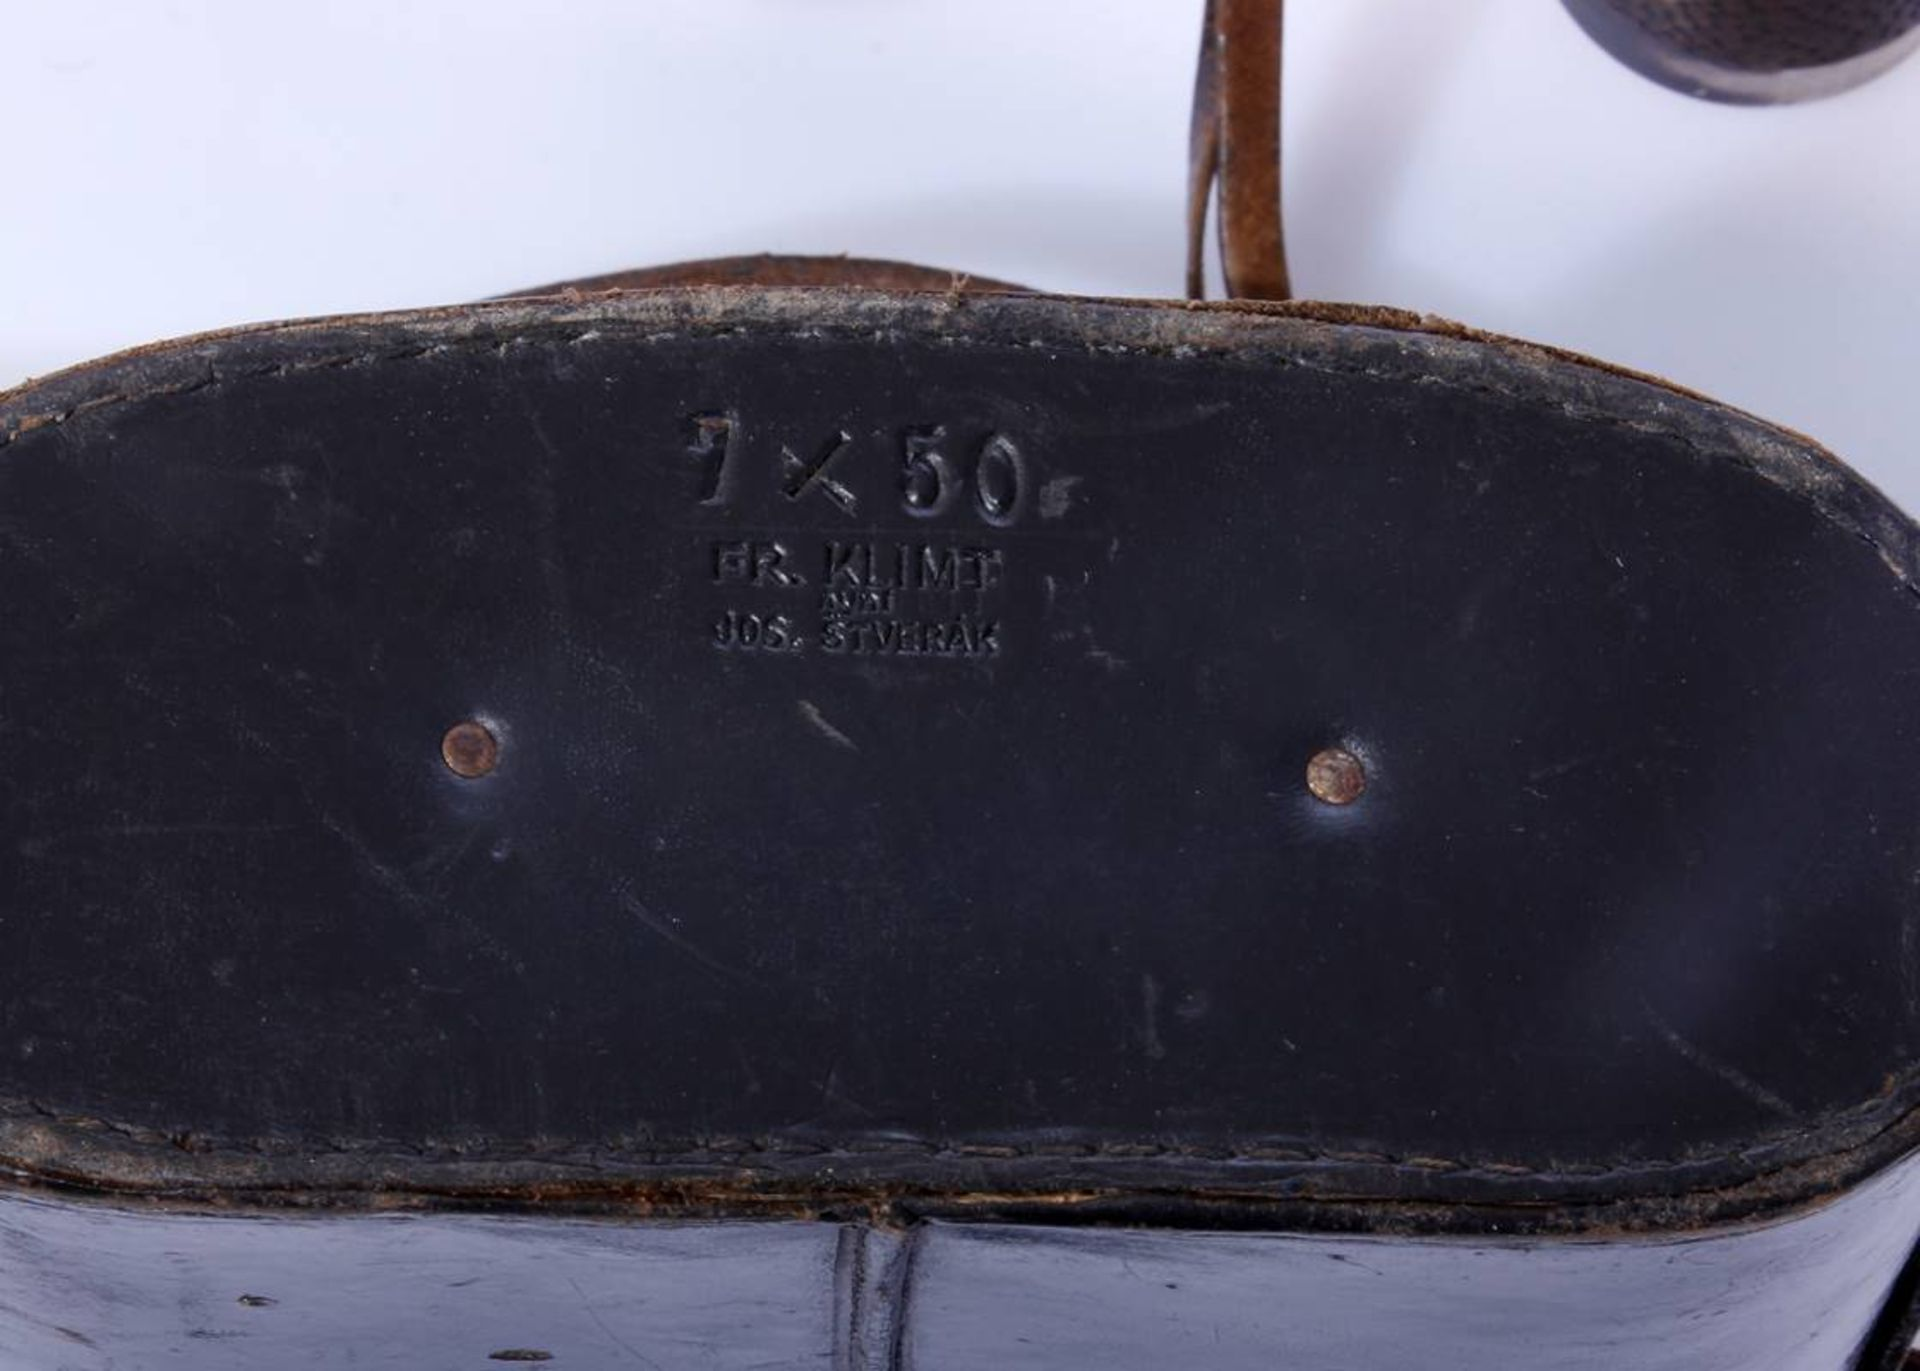 Marinefernglas DE 7 x 50Schwarzes Marinefernglas 7 x 50 DE Karl Zeiss Jena mit Abnahmestempel, - Bild 3 aus 7